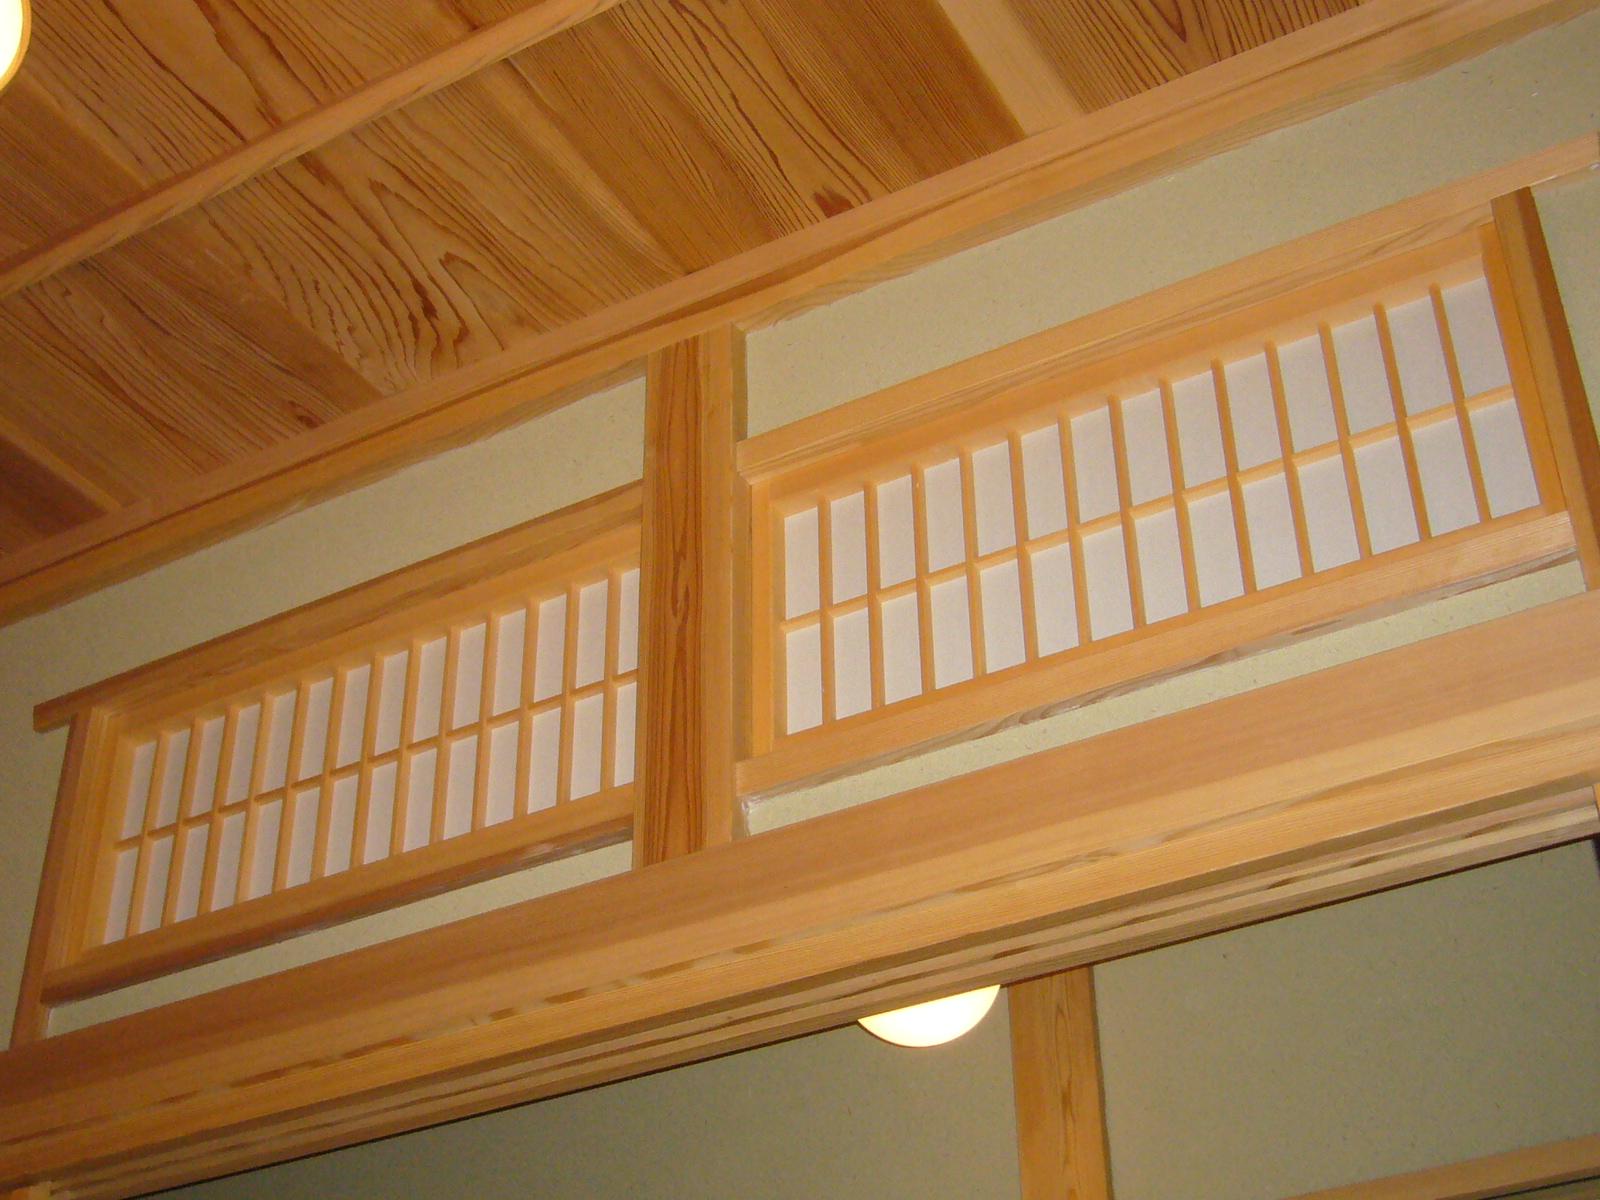 4 Panel Sliding Glass Patio Doors